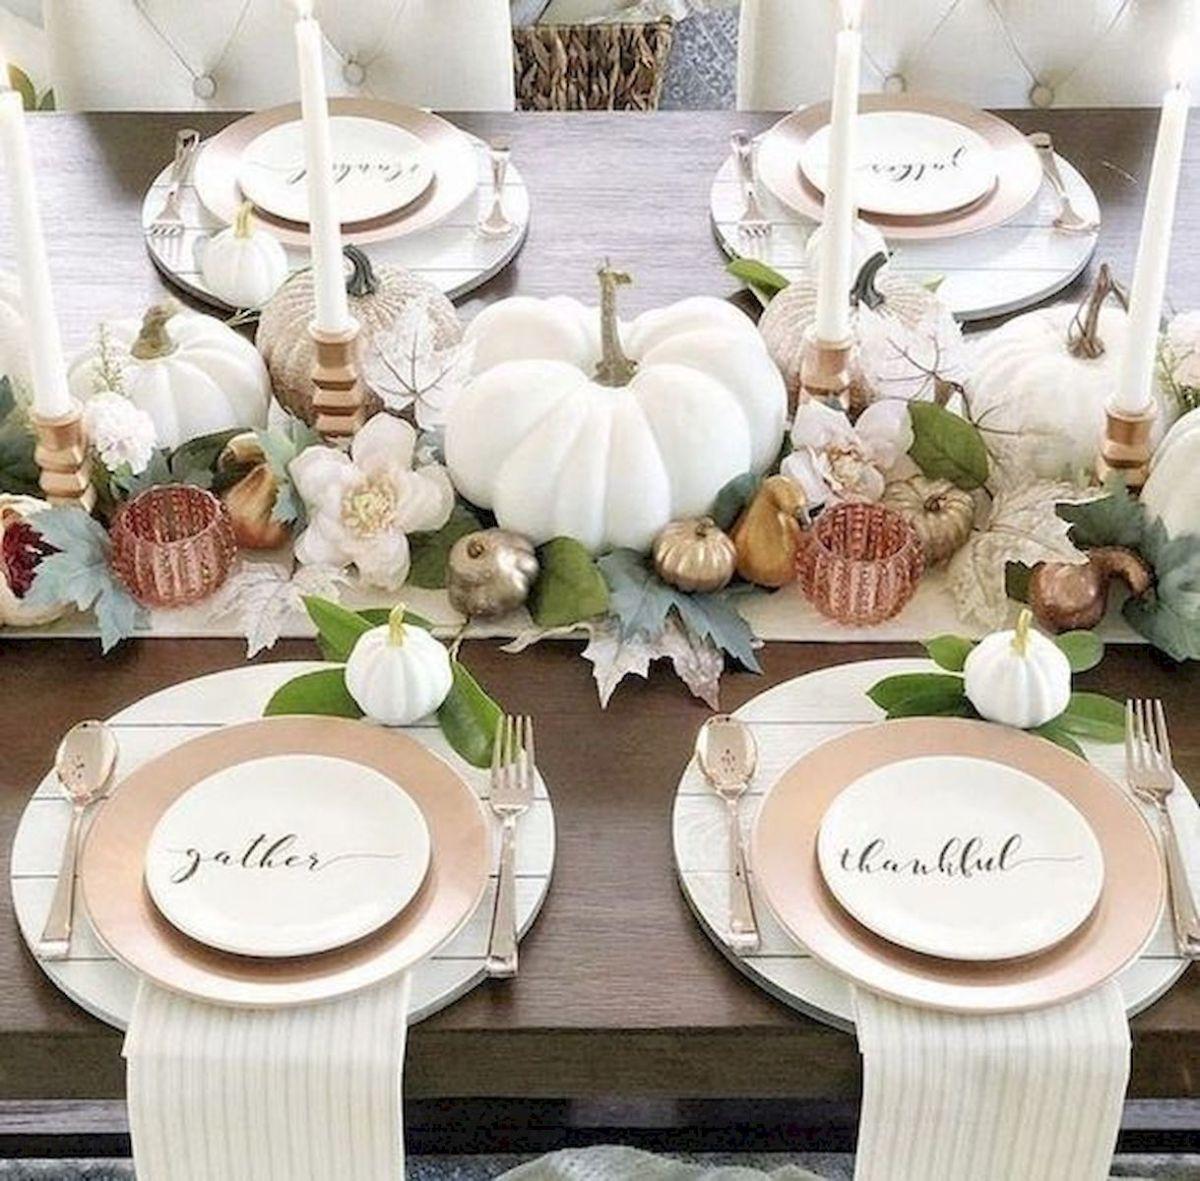 25 Fantastic DIY Thanksgiving Ornament Ideas On A Budget (7)